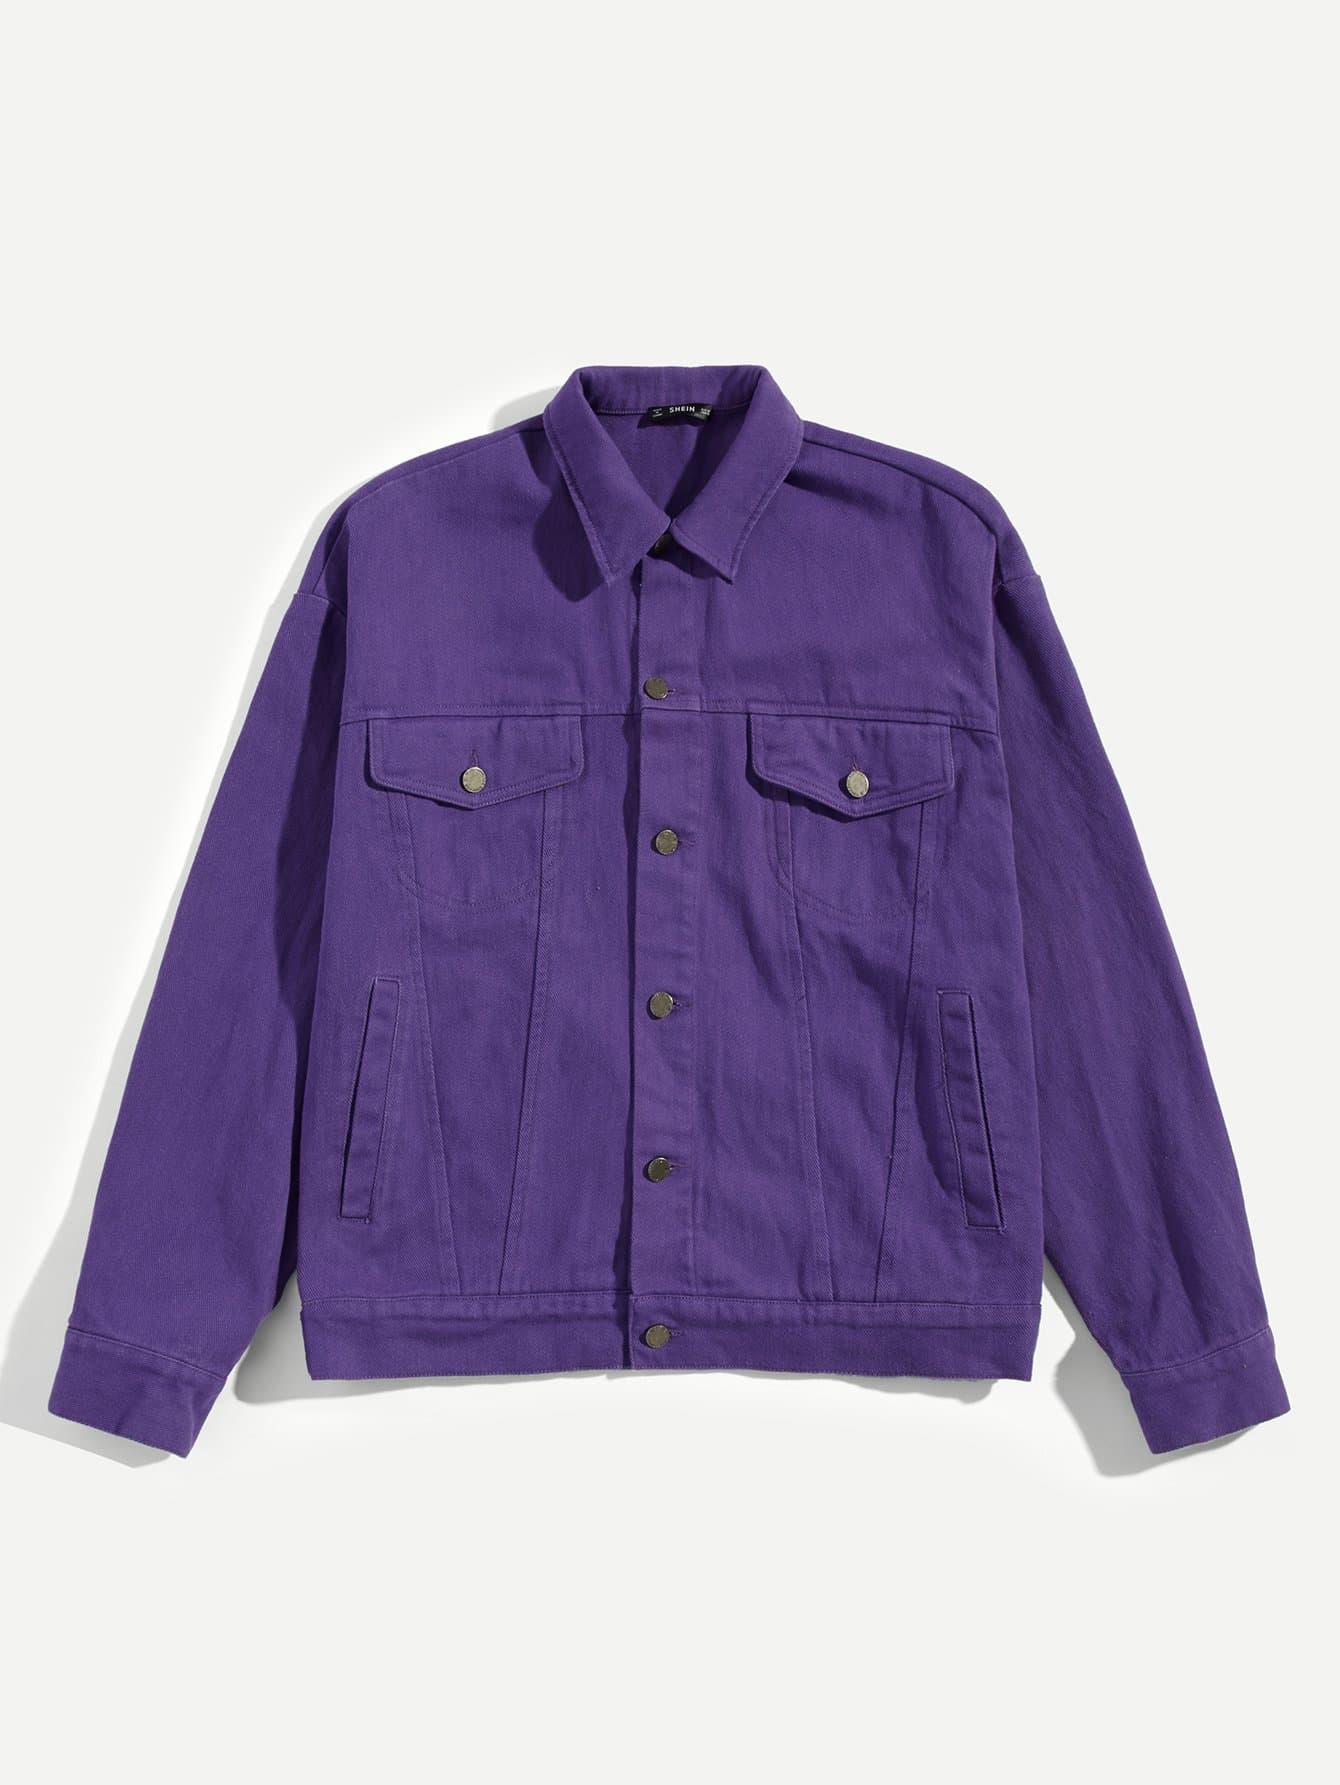 Купить Для мужчин куртка на пуговицах, null, SheIn